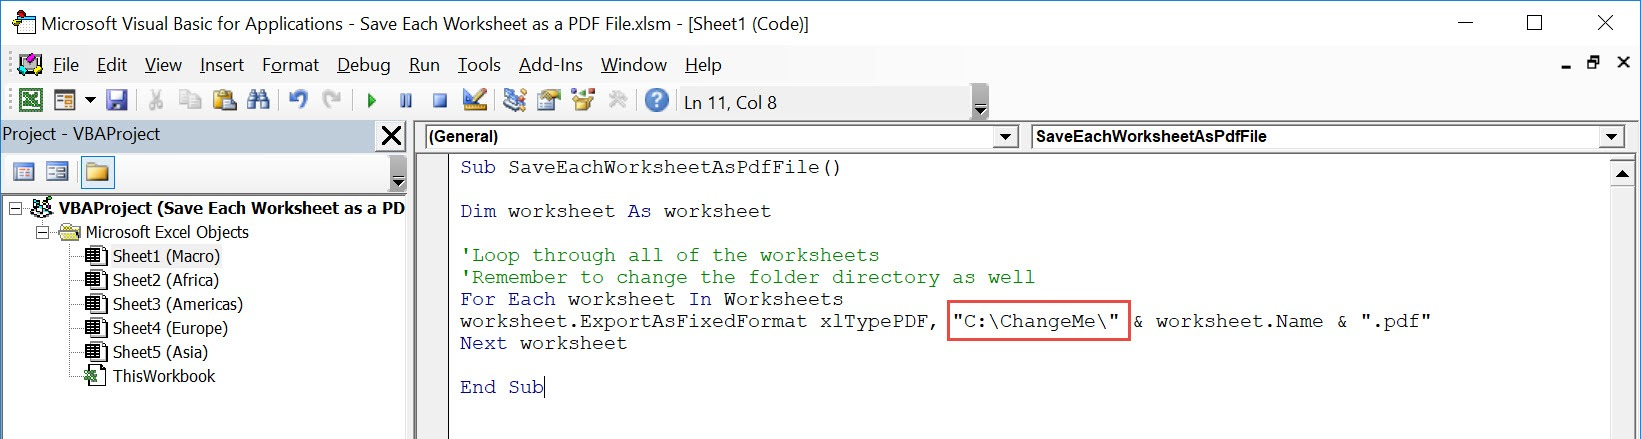 Save Each Worksheet As A Pdf File Using Macros Myexcelonline